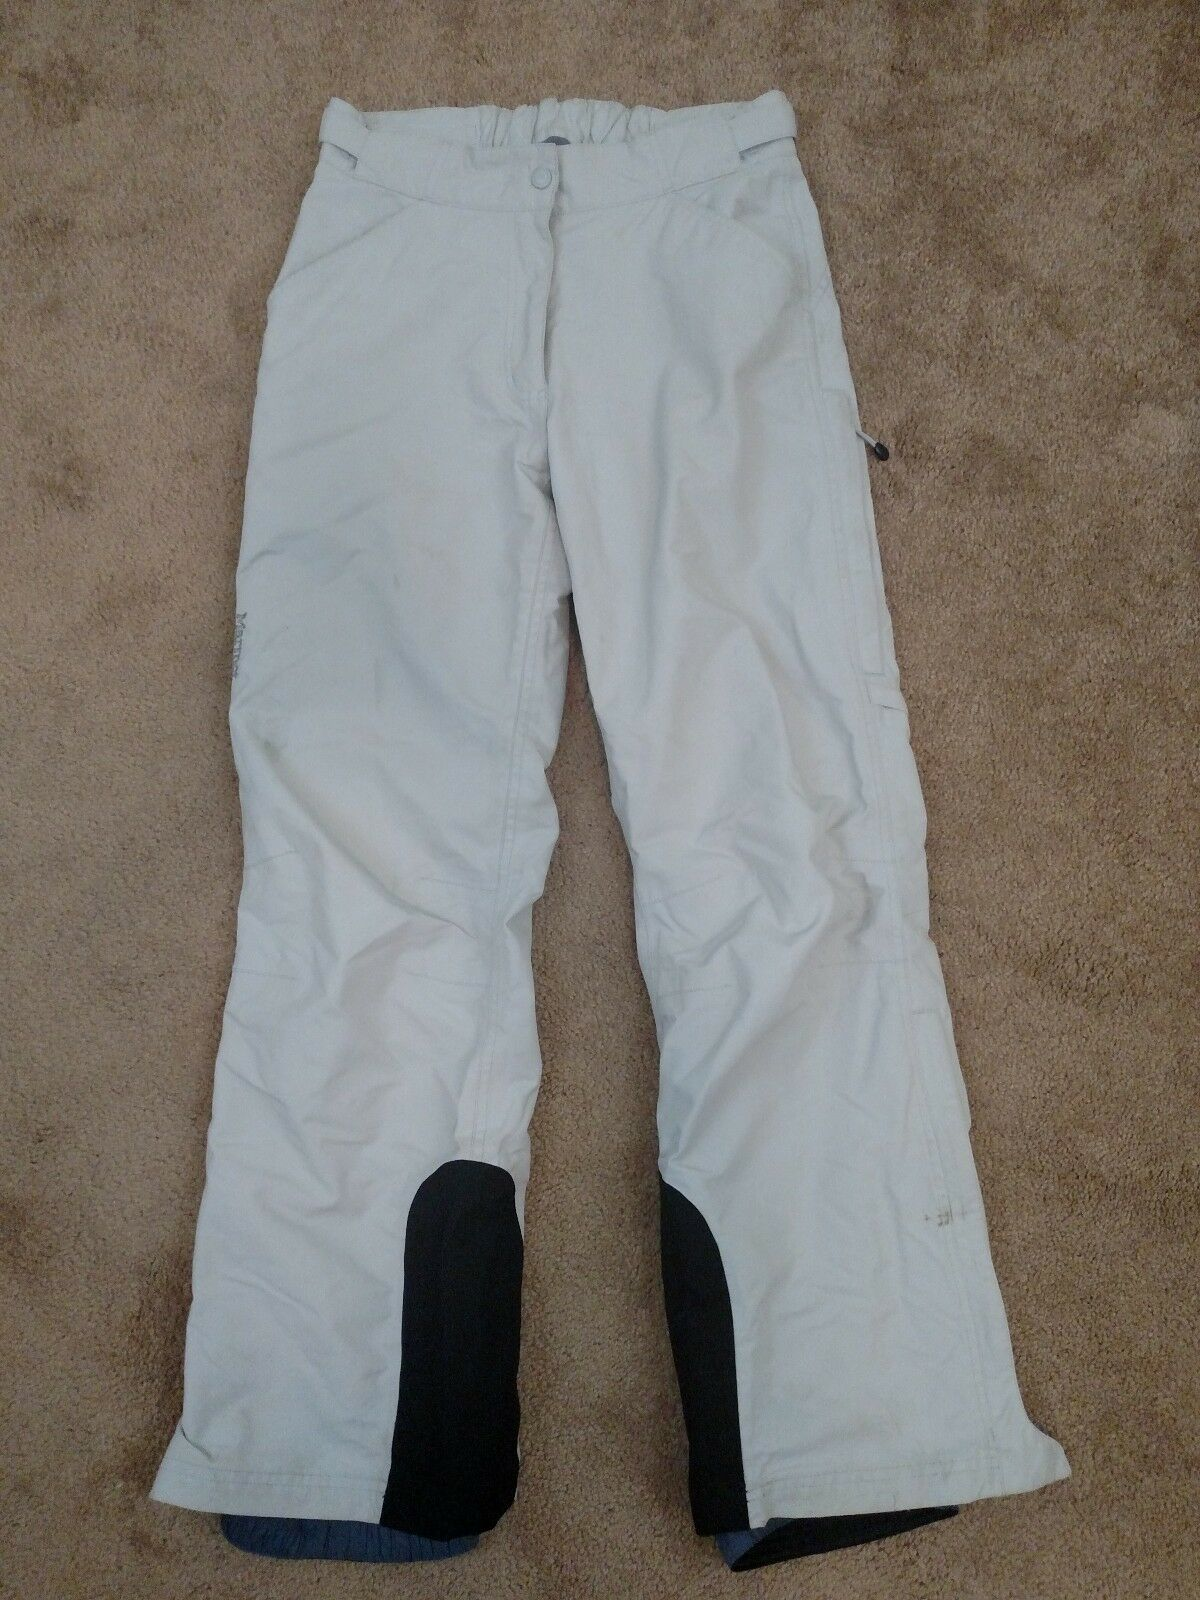 Marmot Snow Sky Snowboarding Pants Adjustable Waist  Size  S Small